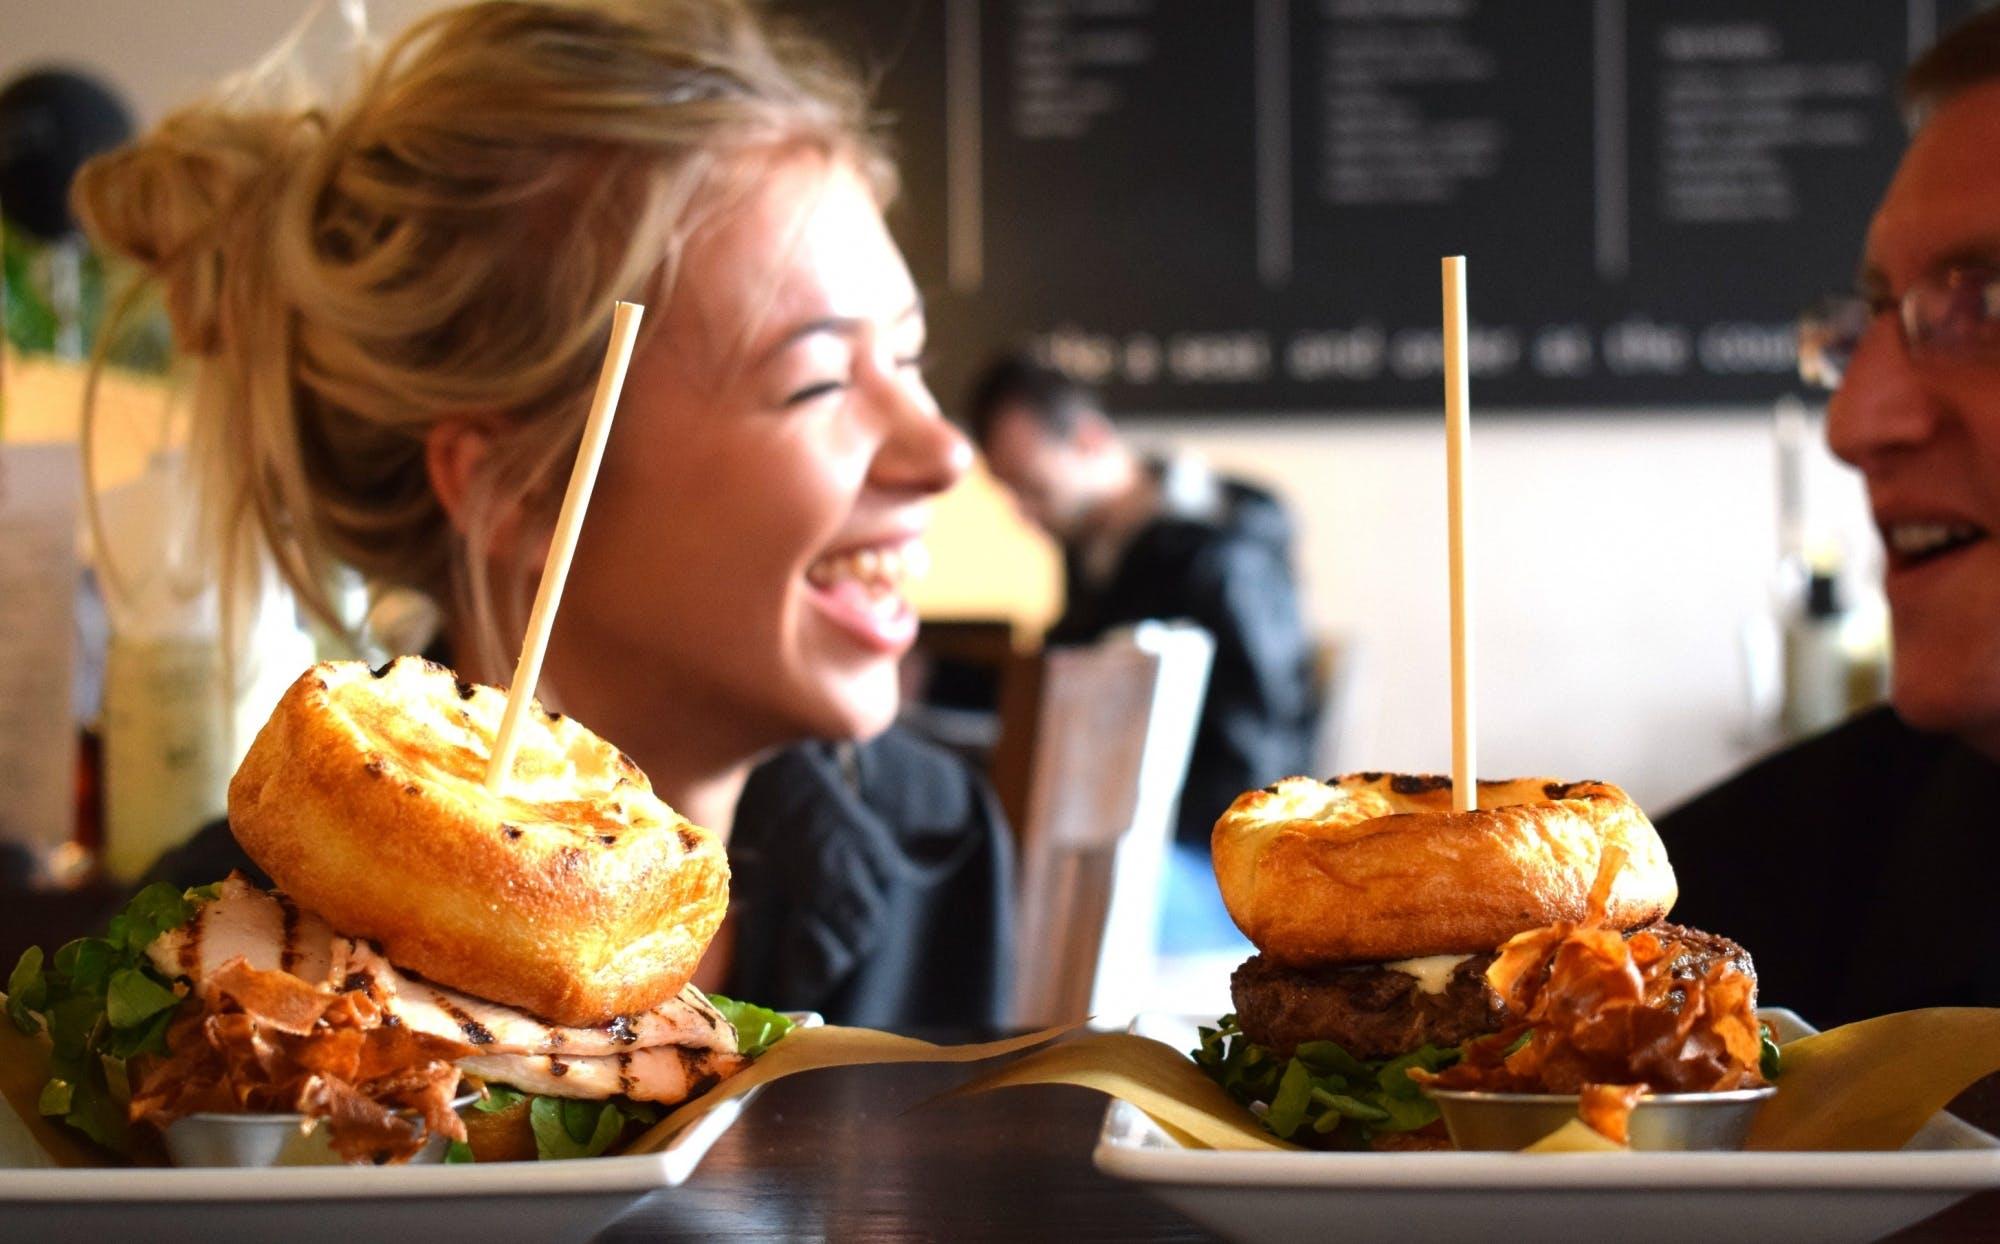 The Yorkie burger range